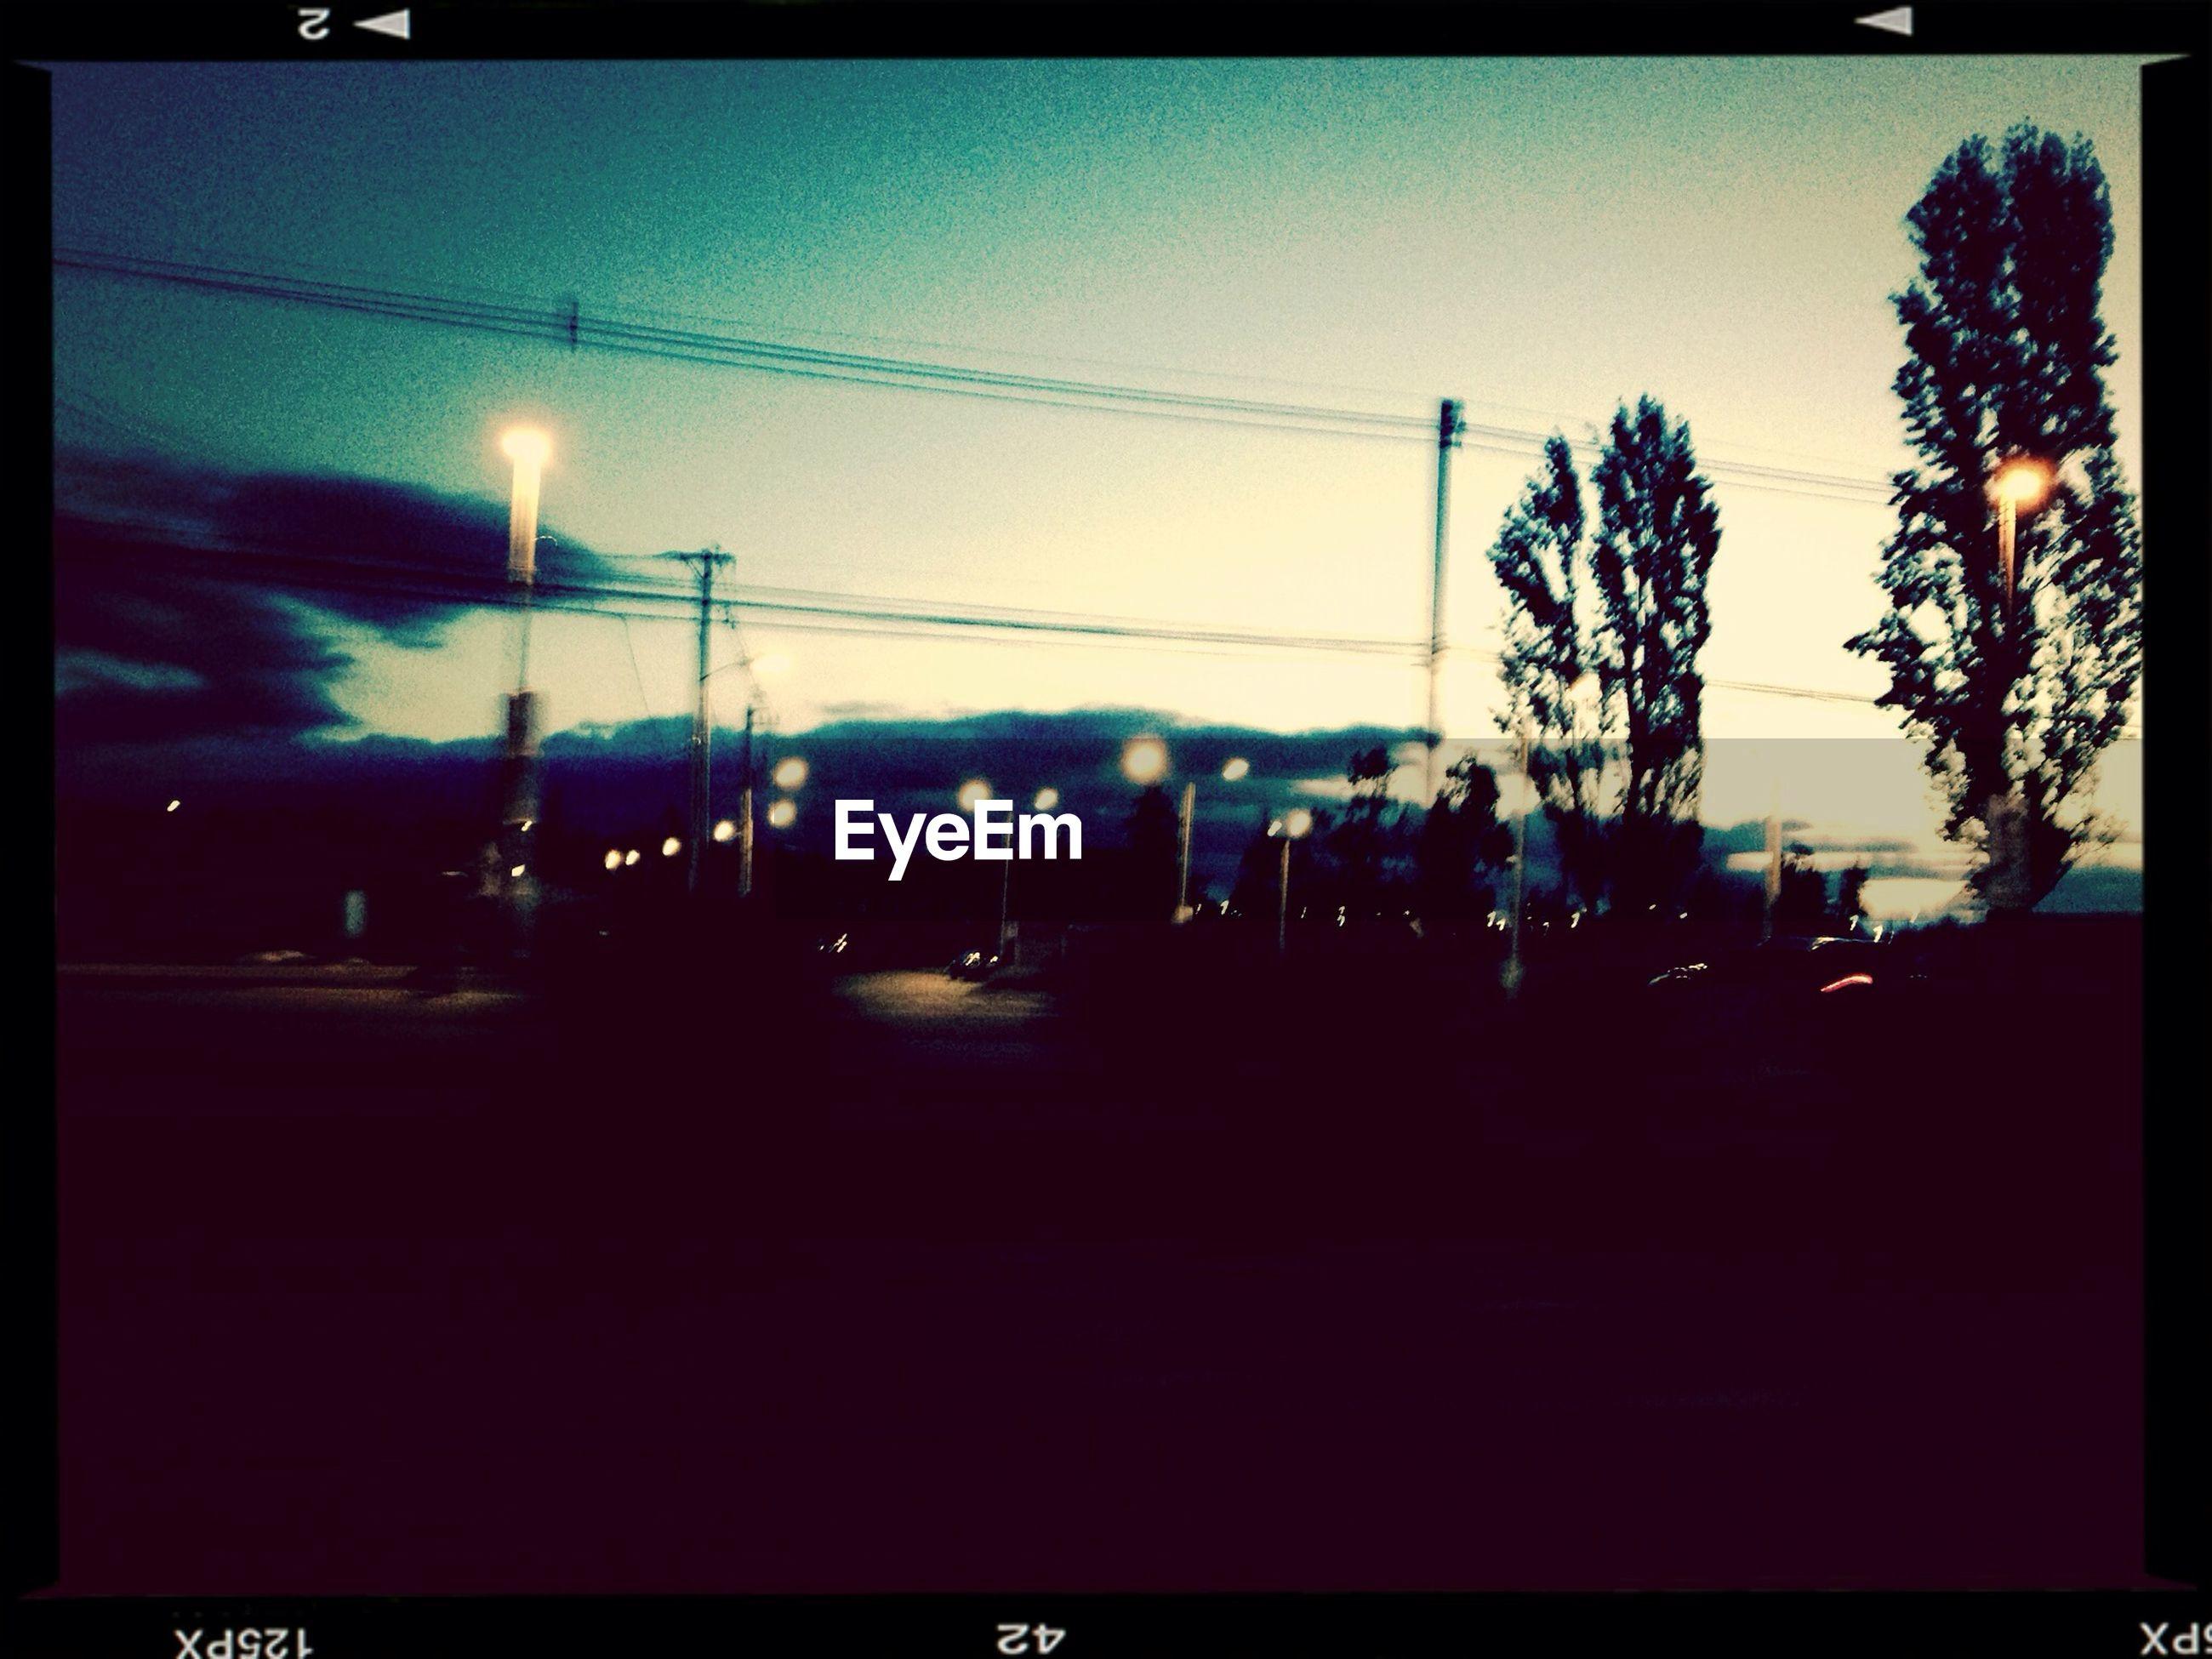 VIEW OF ILLUMINATED STREET LIGHTS